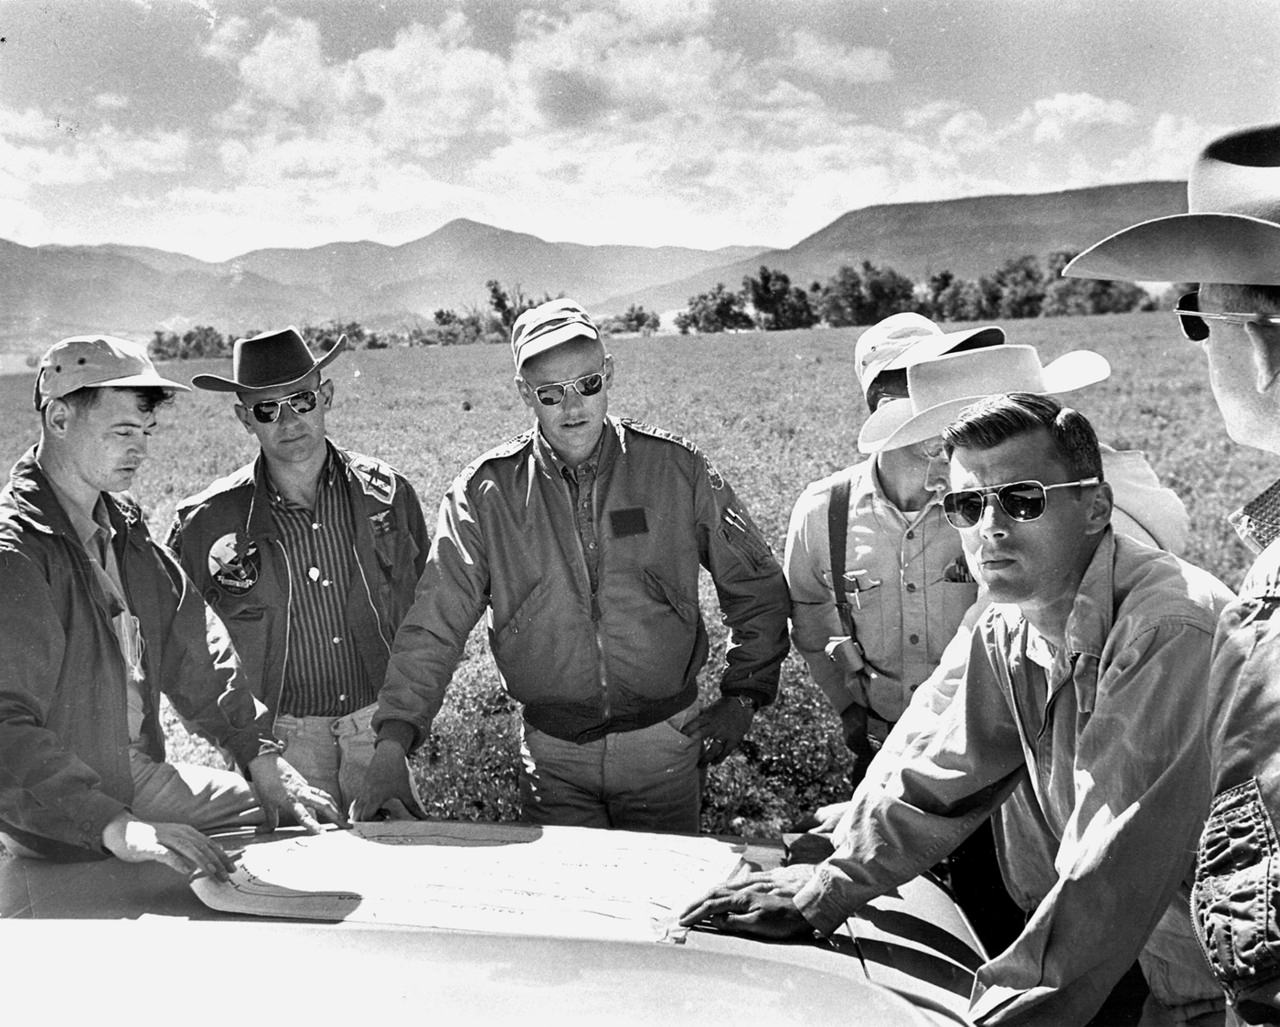 Astronauts in Sunglasses